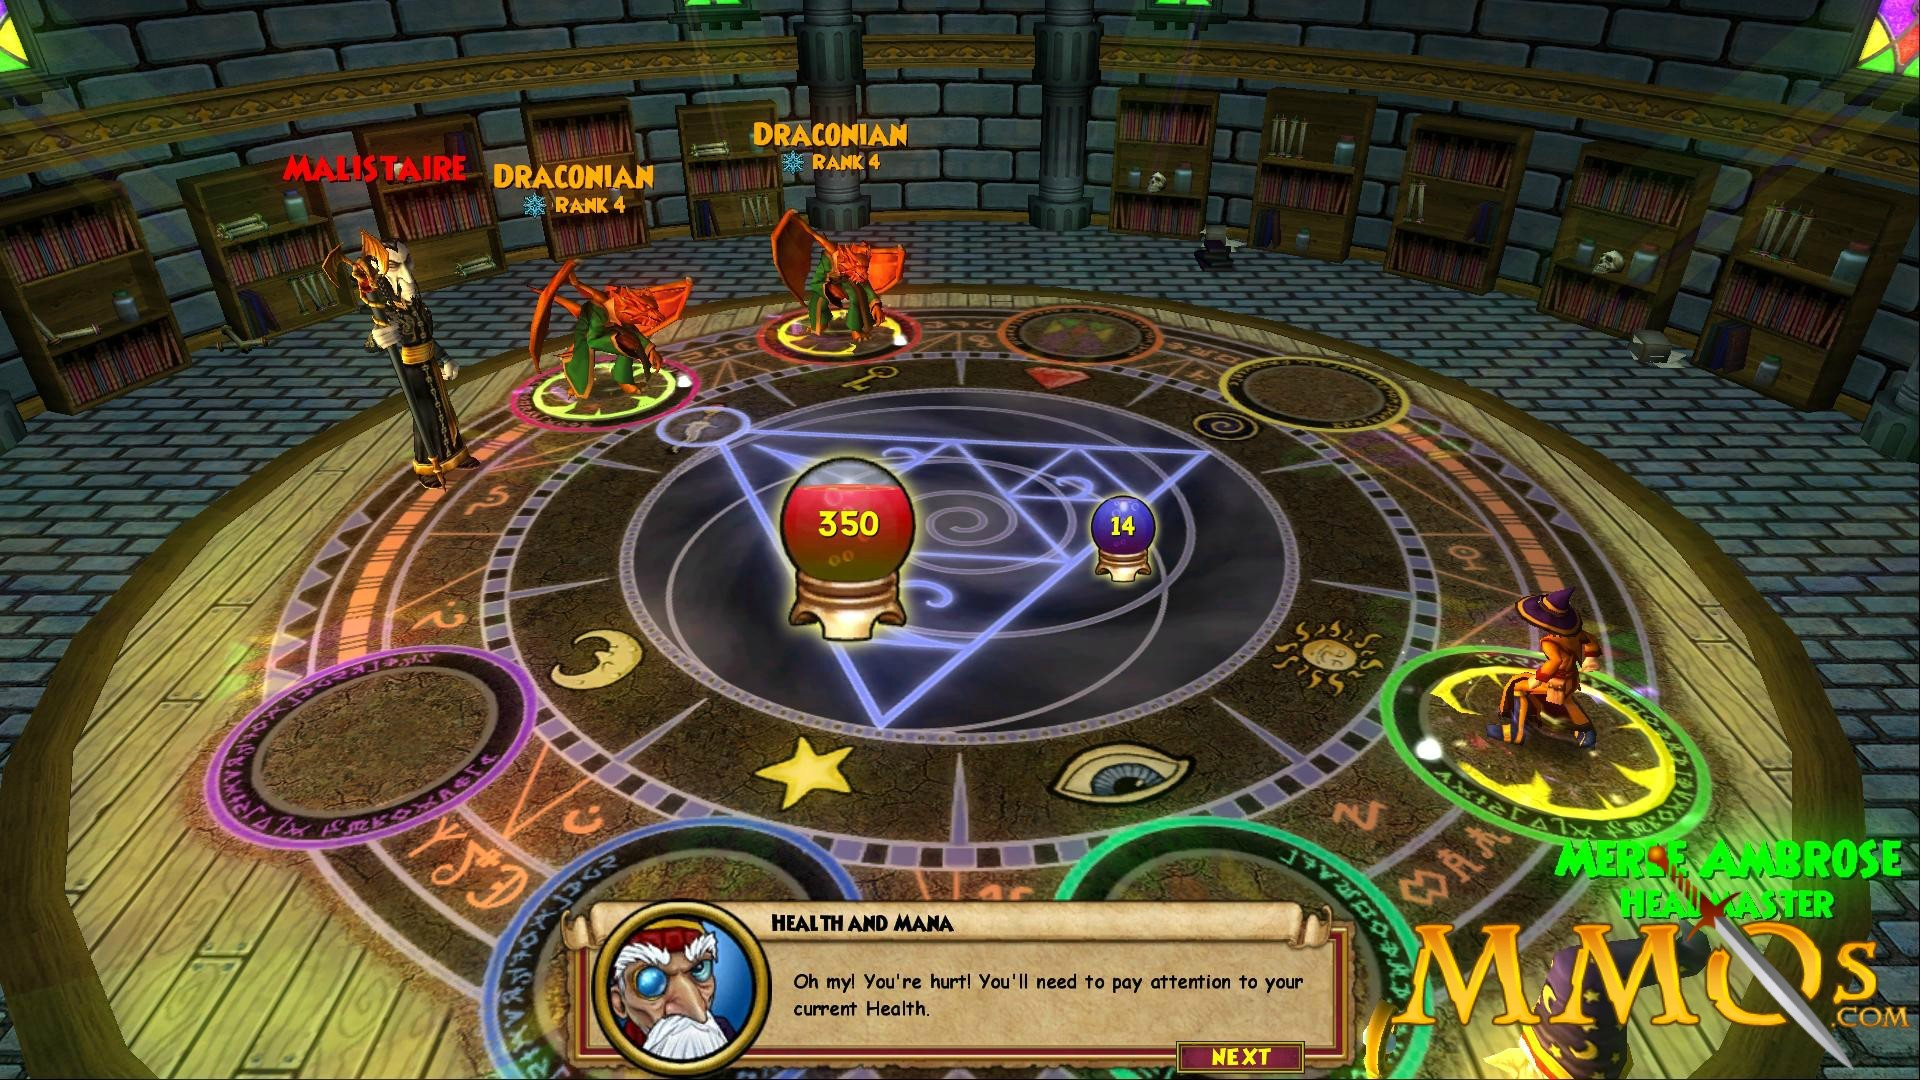 Res: 1920x1080, Wizard101 battle